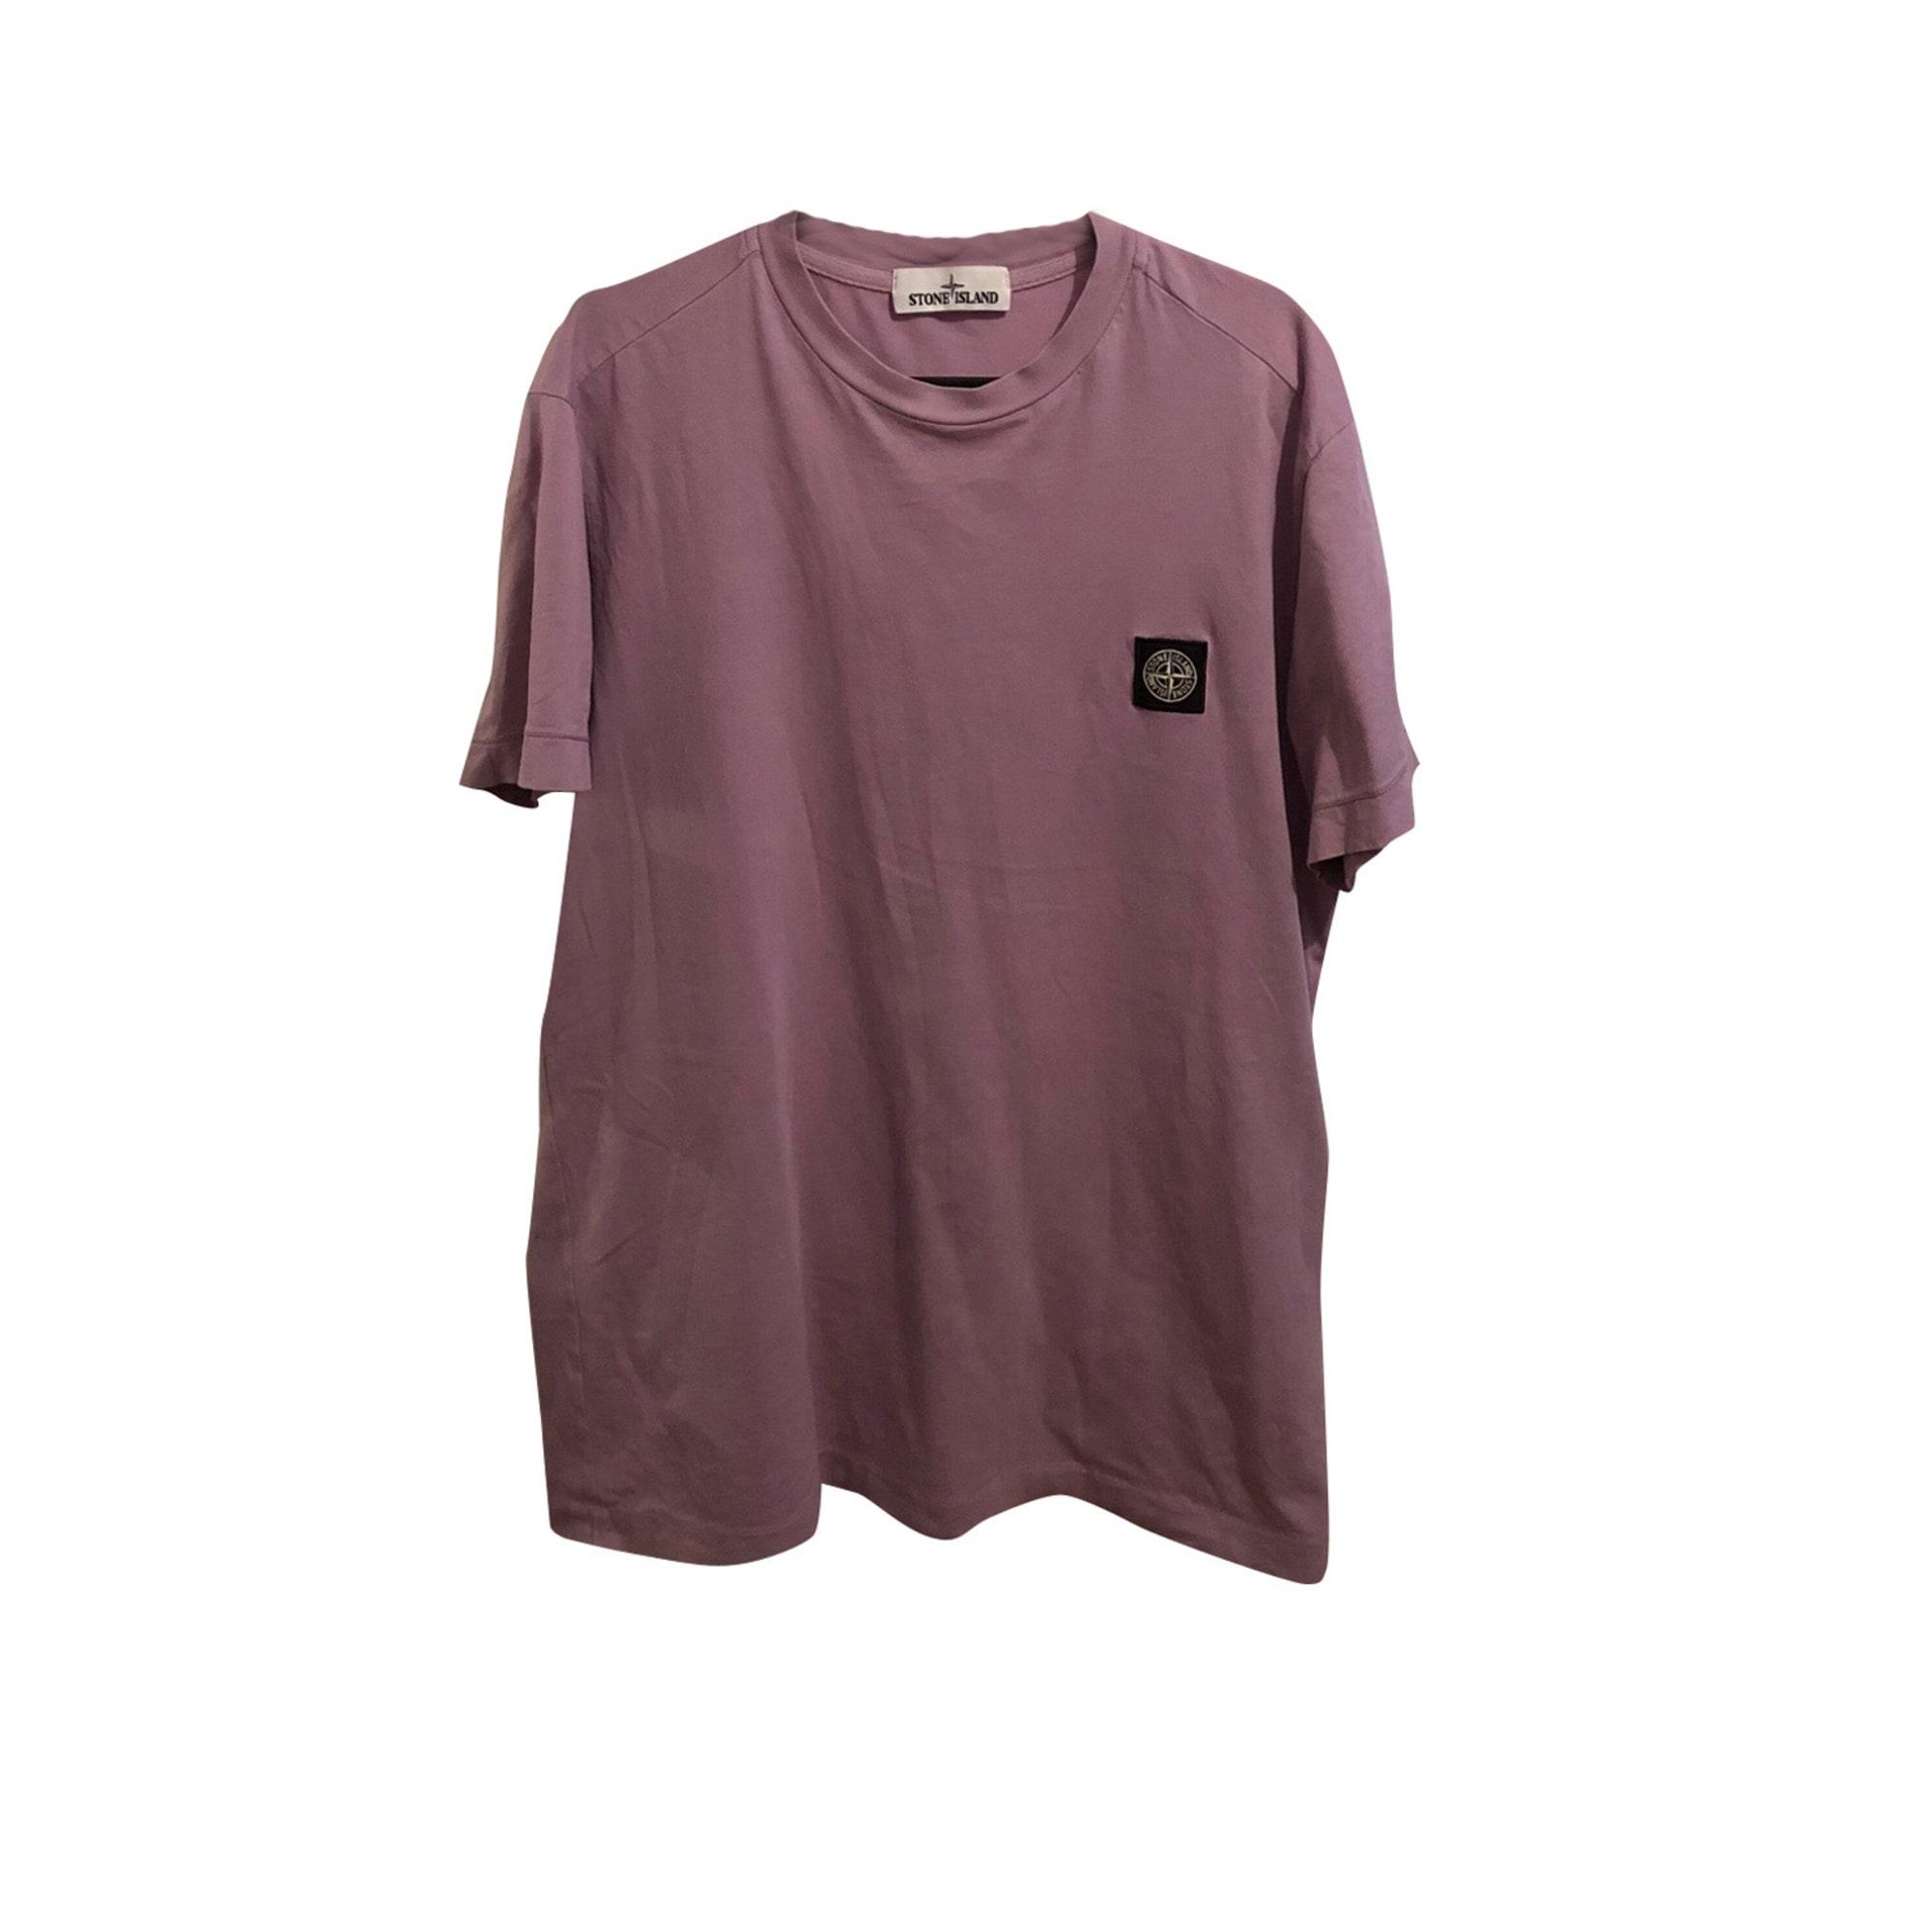 Tee-shirt STONE ISLAND Violet, mauve, lavande